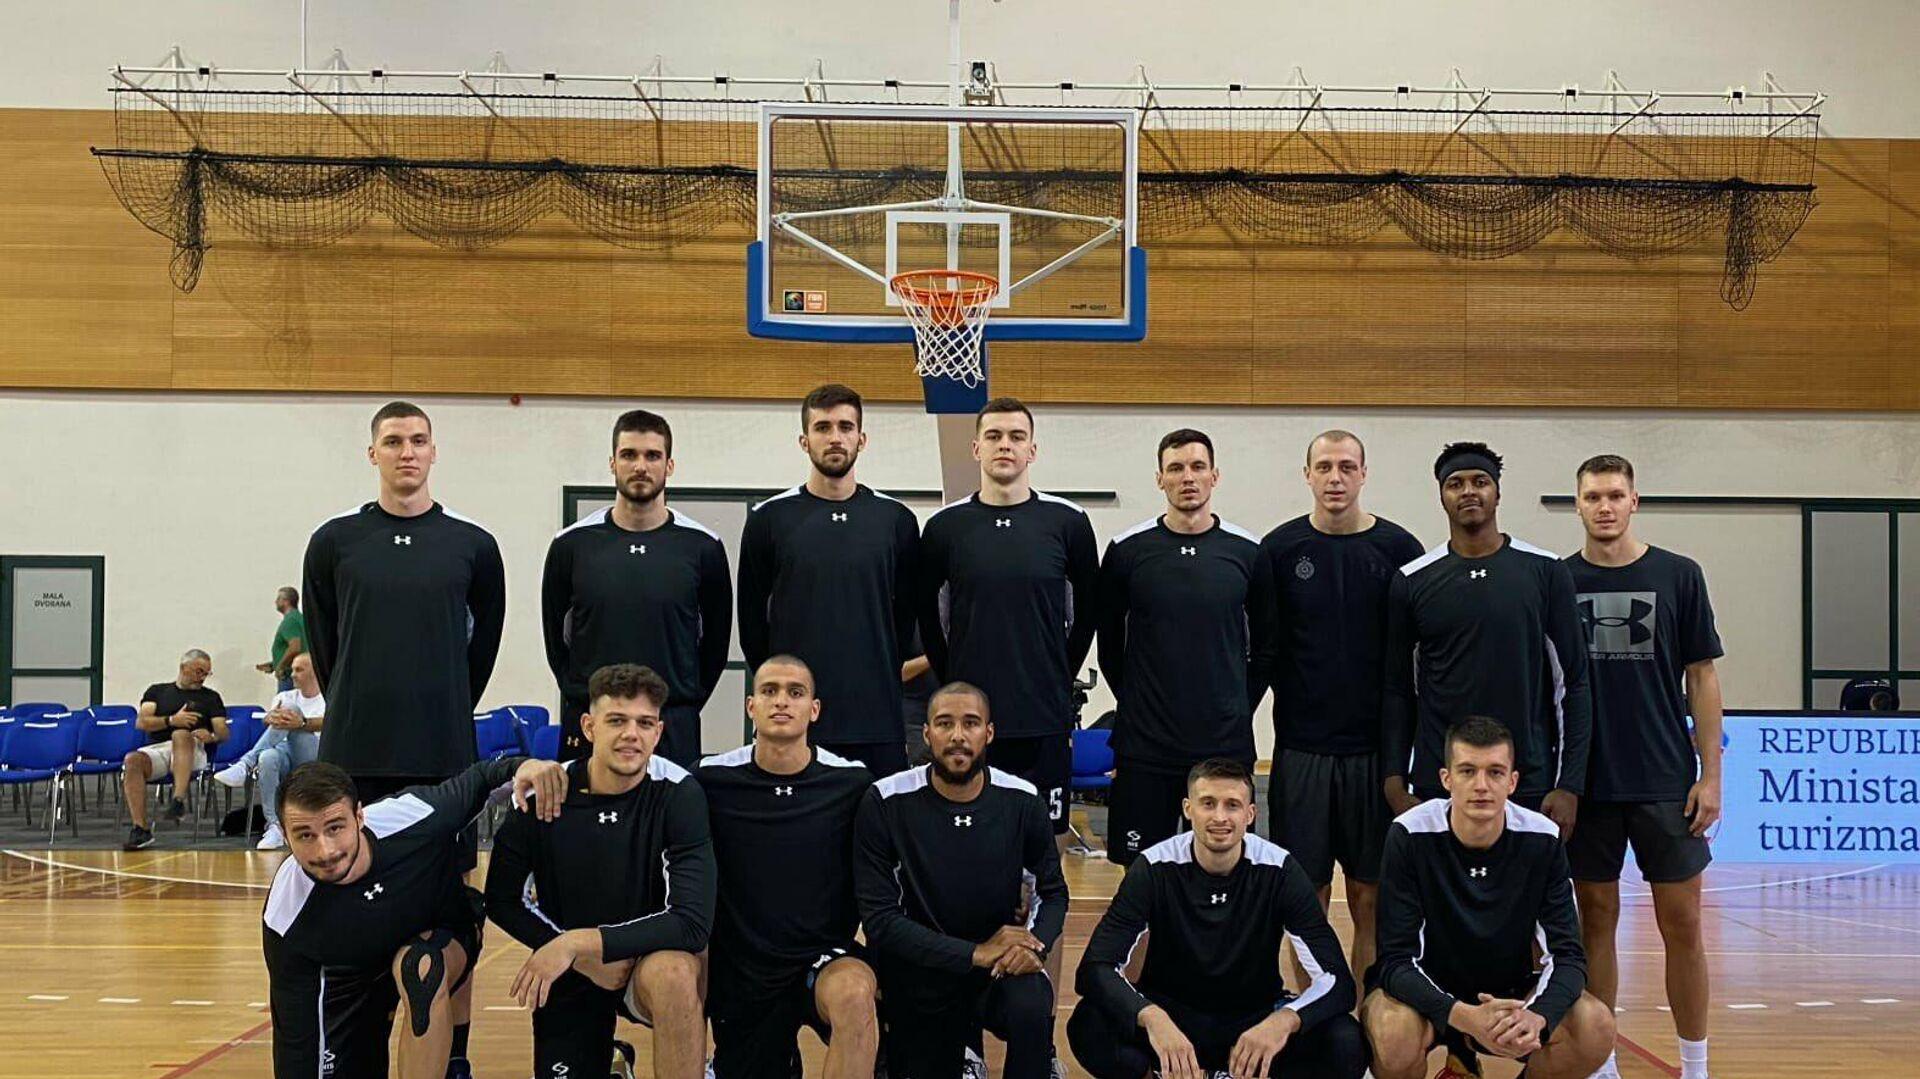 Košarkaši Partizana - Sputnik Srbija, 1920, 01.09.2021